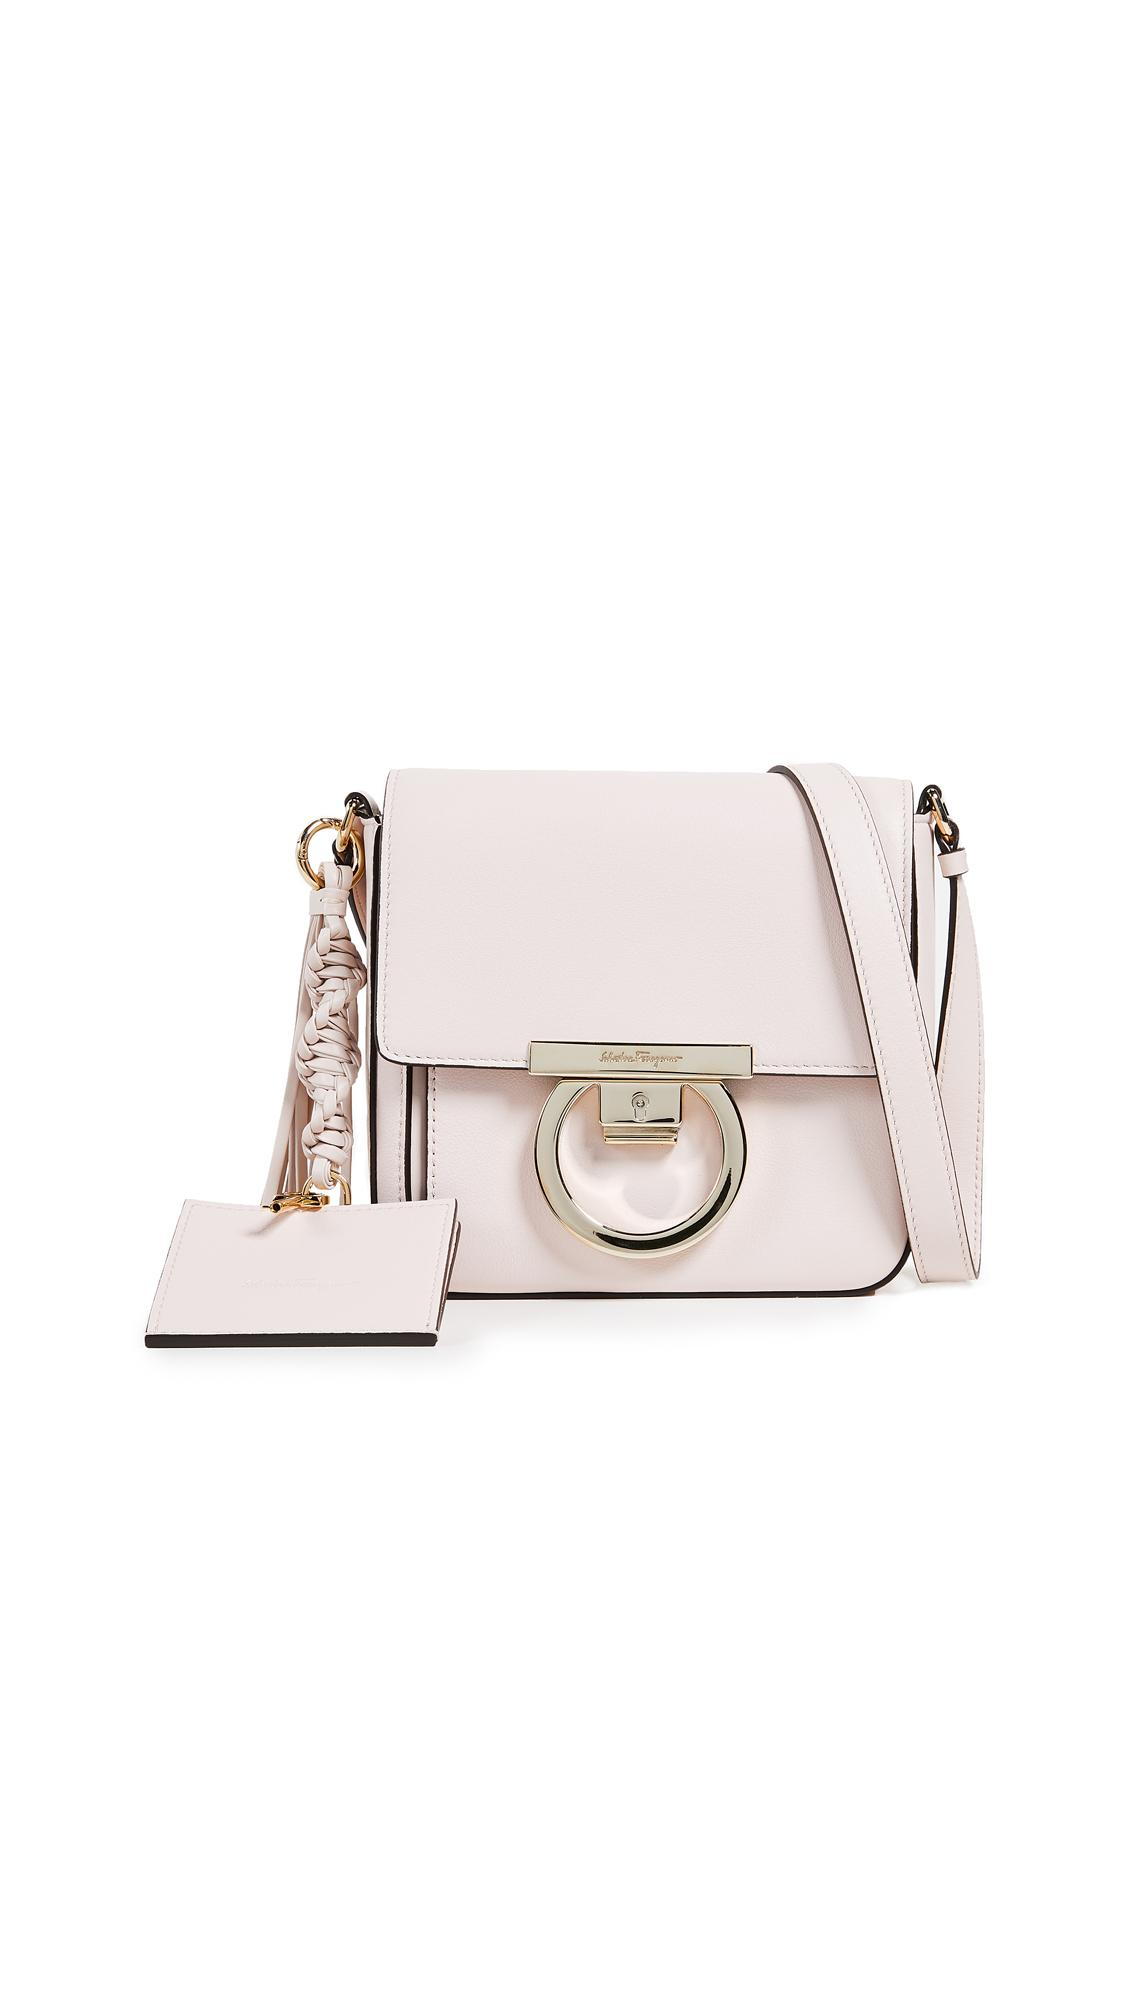 Salvatore Ferragamo Gancio Lock Leather Crossbody Bag - White In Jasmine  Flower 98699ab89e433